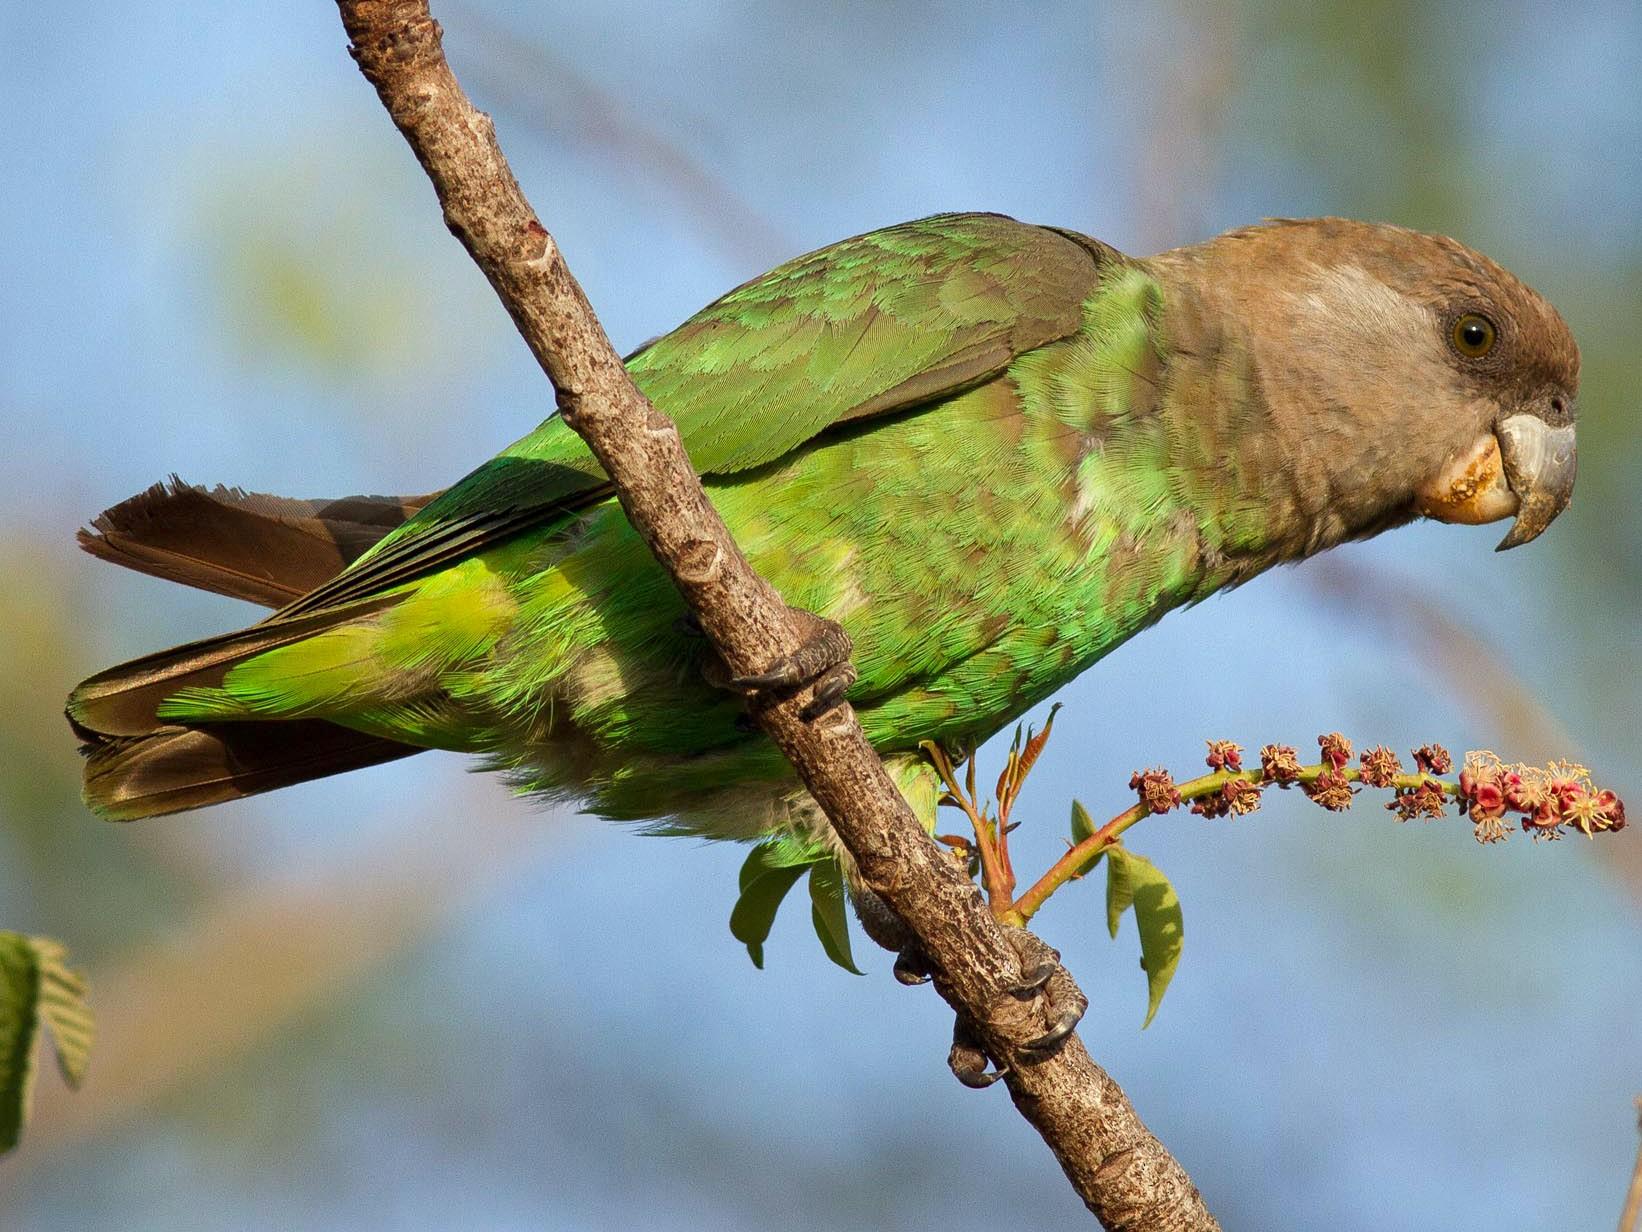 Brown-headed Parrot - Josh Engel